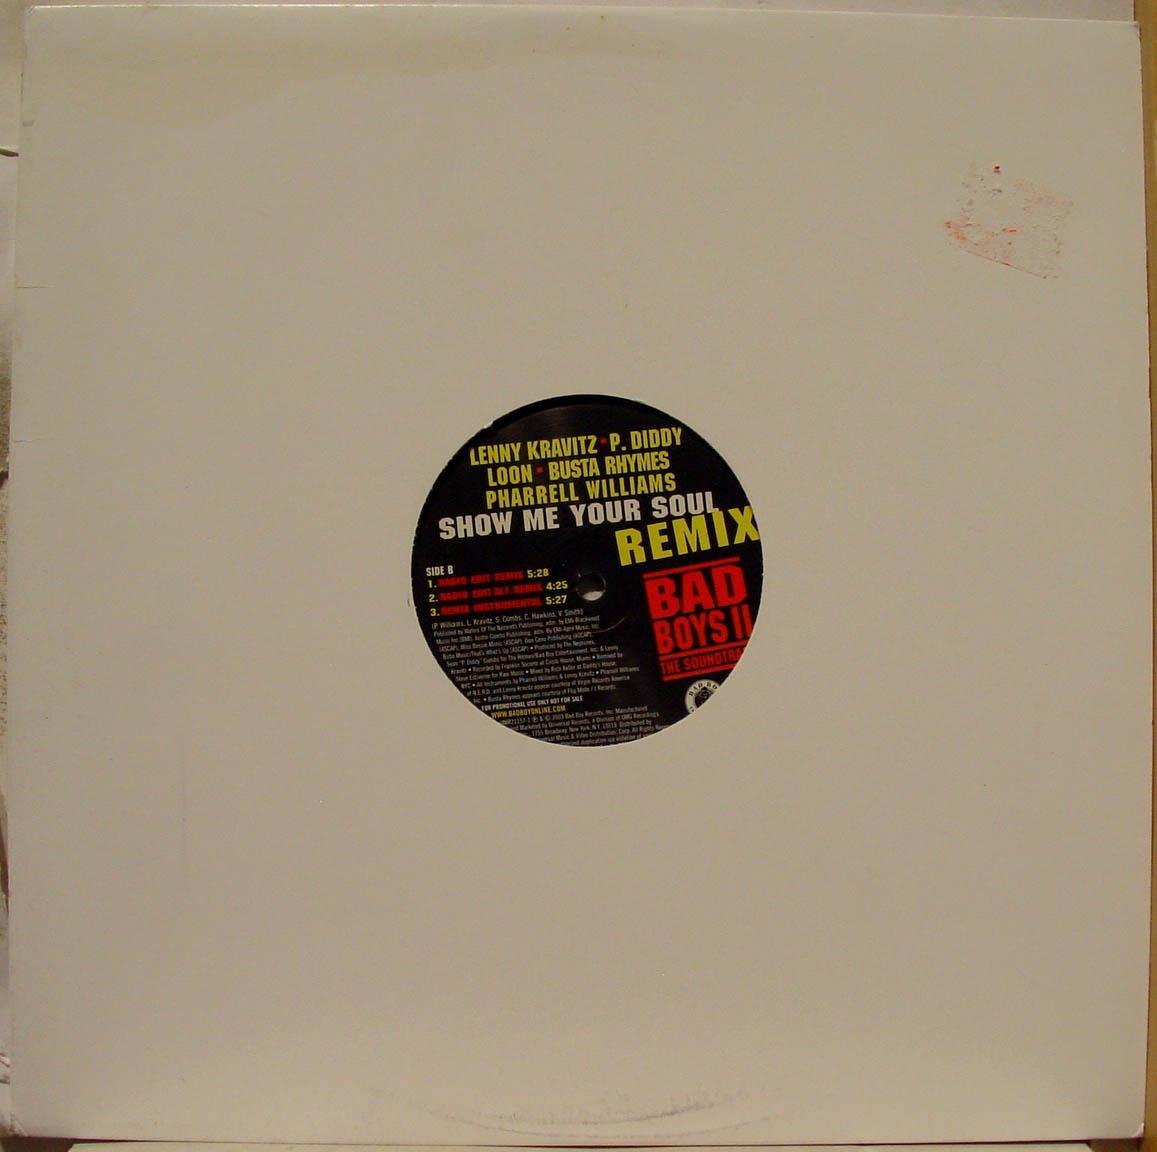 P Diddy / Lenny Kravitz / Pharrell Williams / Loon - P Diddy